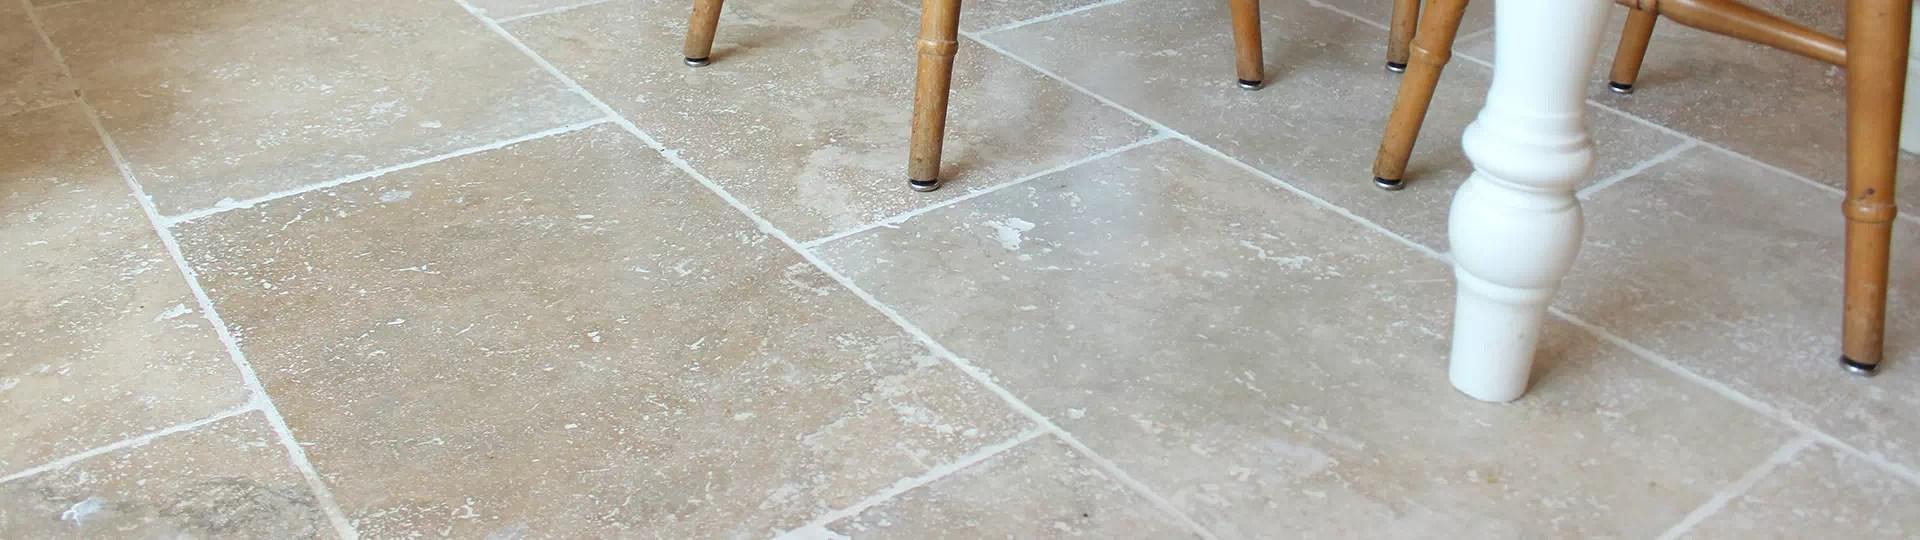 how to clean travertine floors simple